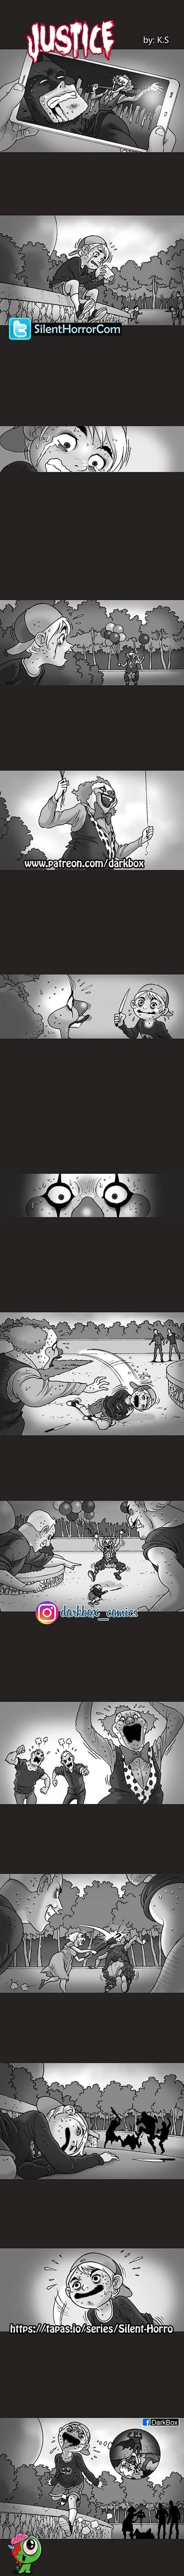 【6upoker】恐怖黑白漫画鬼故事 无声漫画令人毛骨悚然